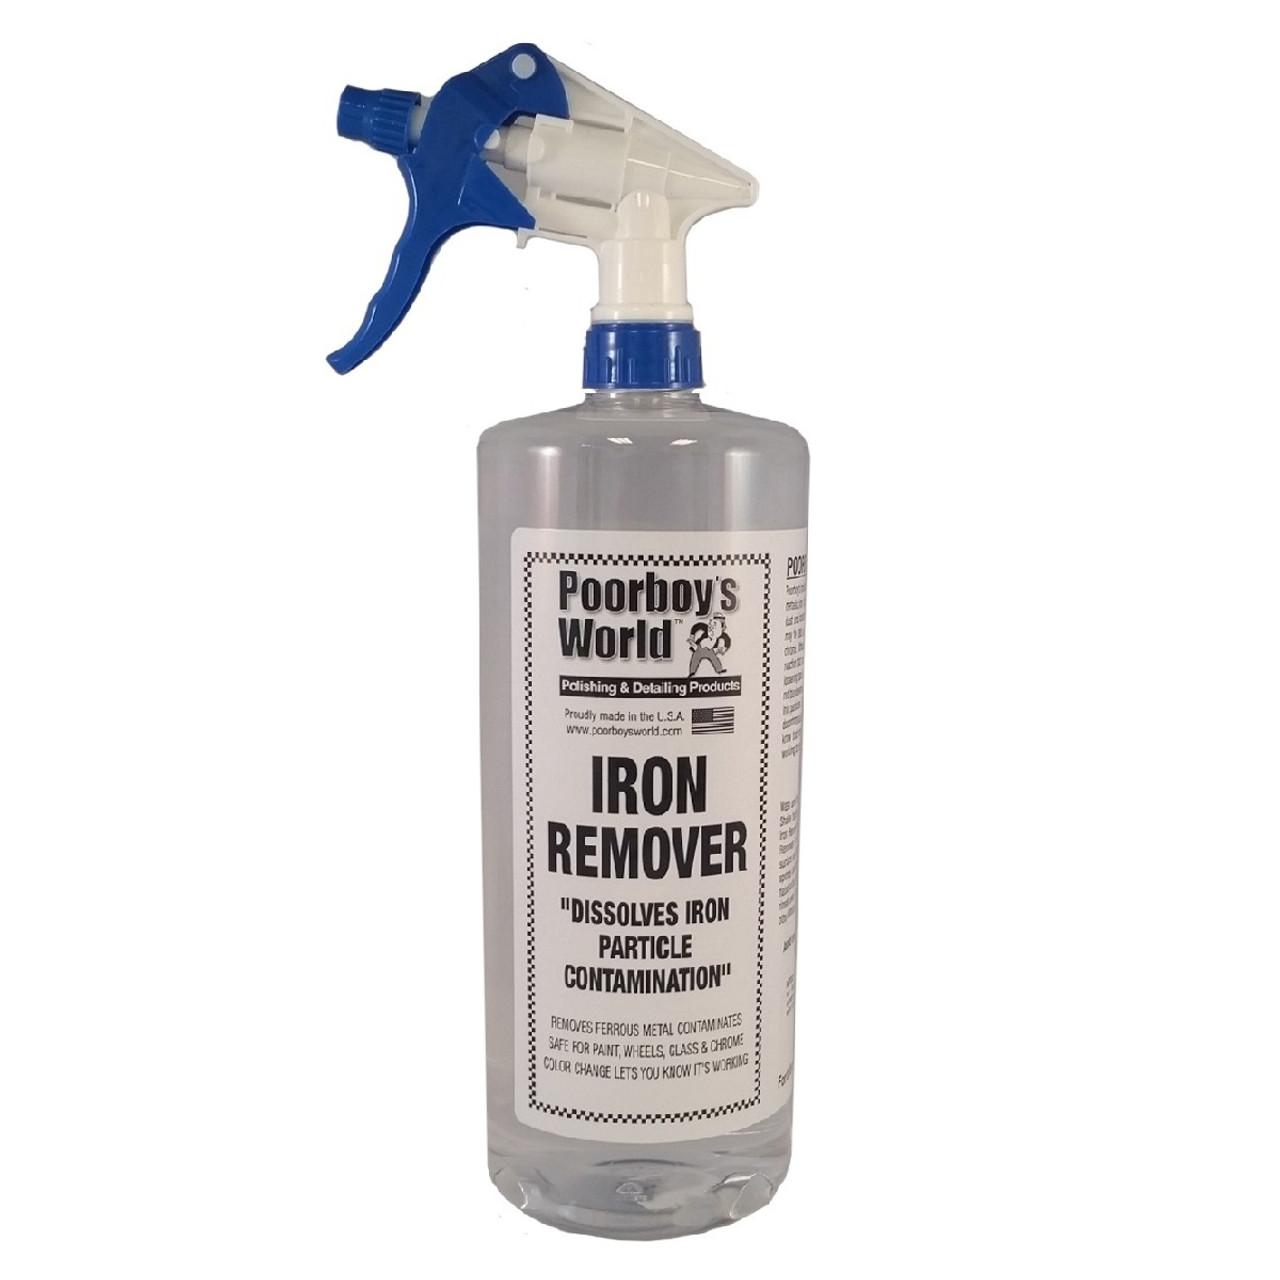 Poorboy's World Iron Remover 32oz w/Sprayer